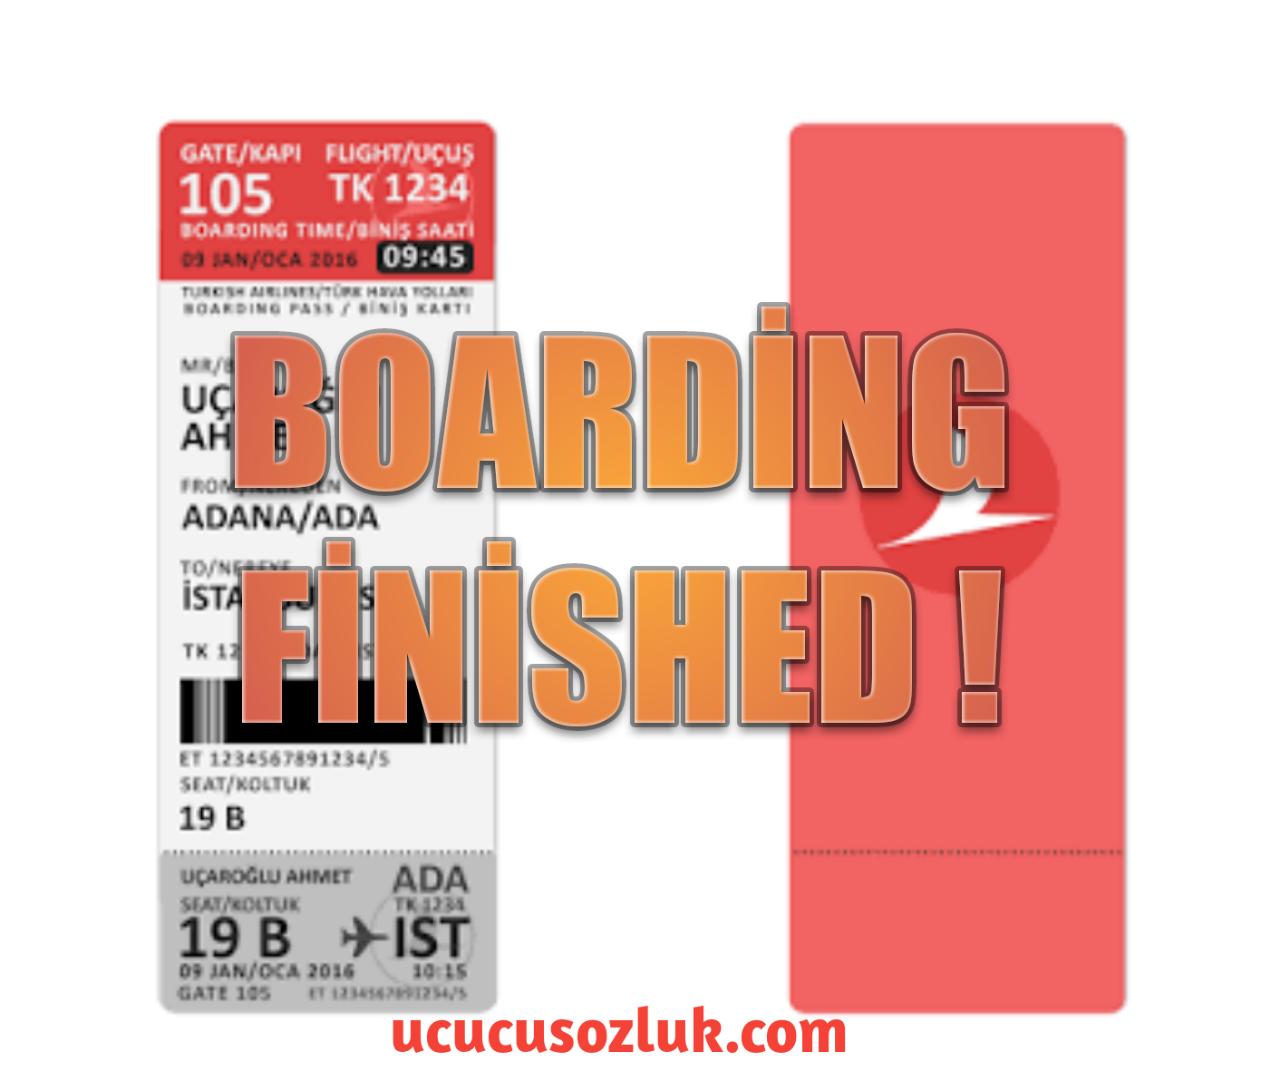 Boarding'in daha erken kapanması